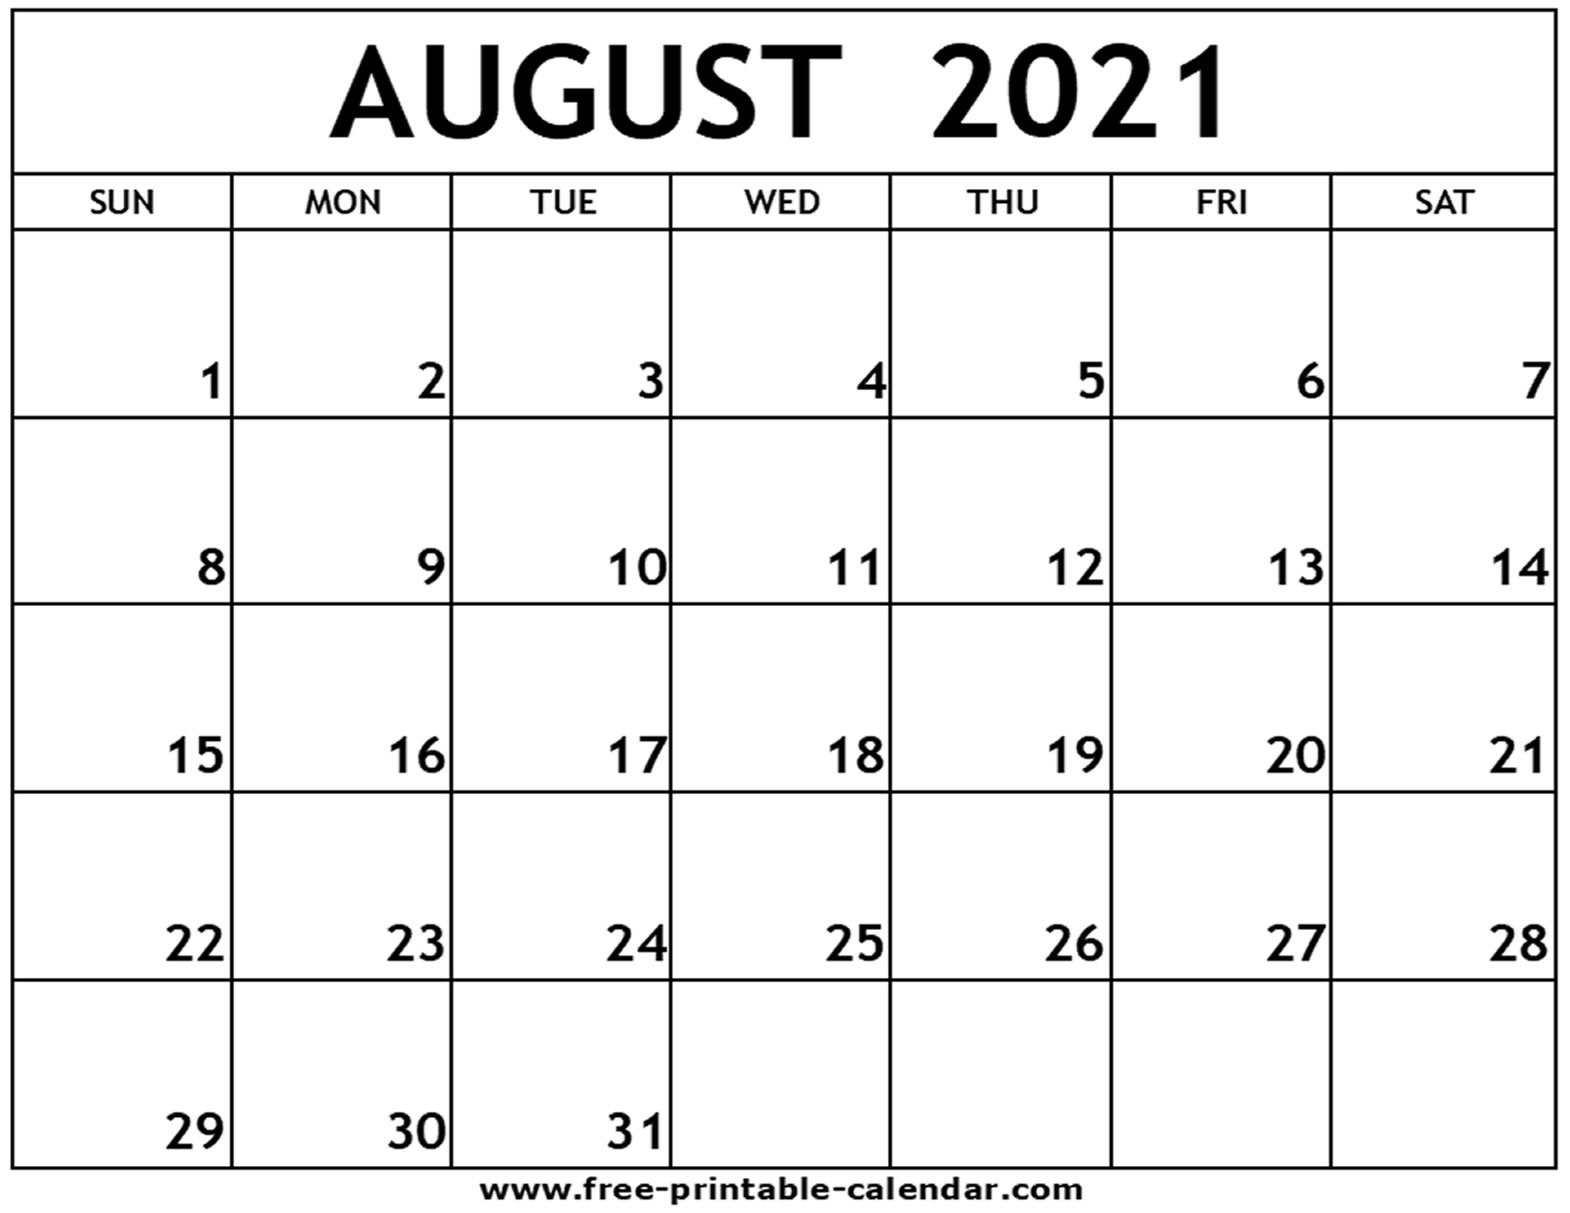 Take Printable Calendar August 2021